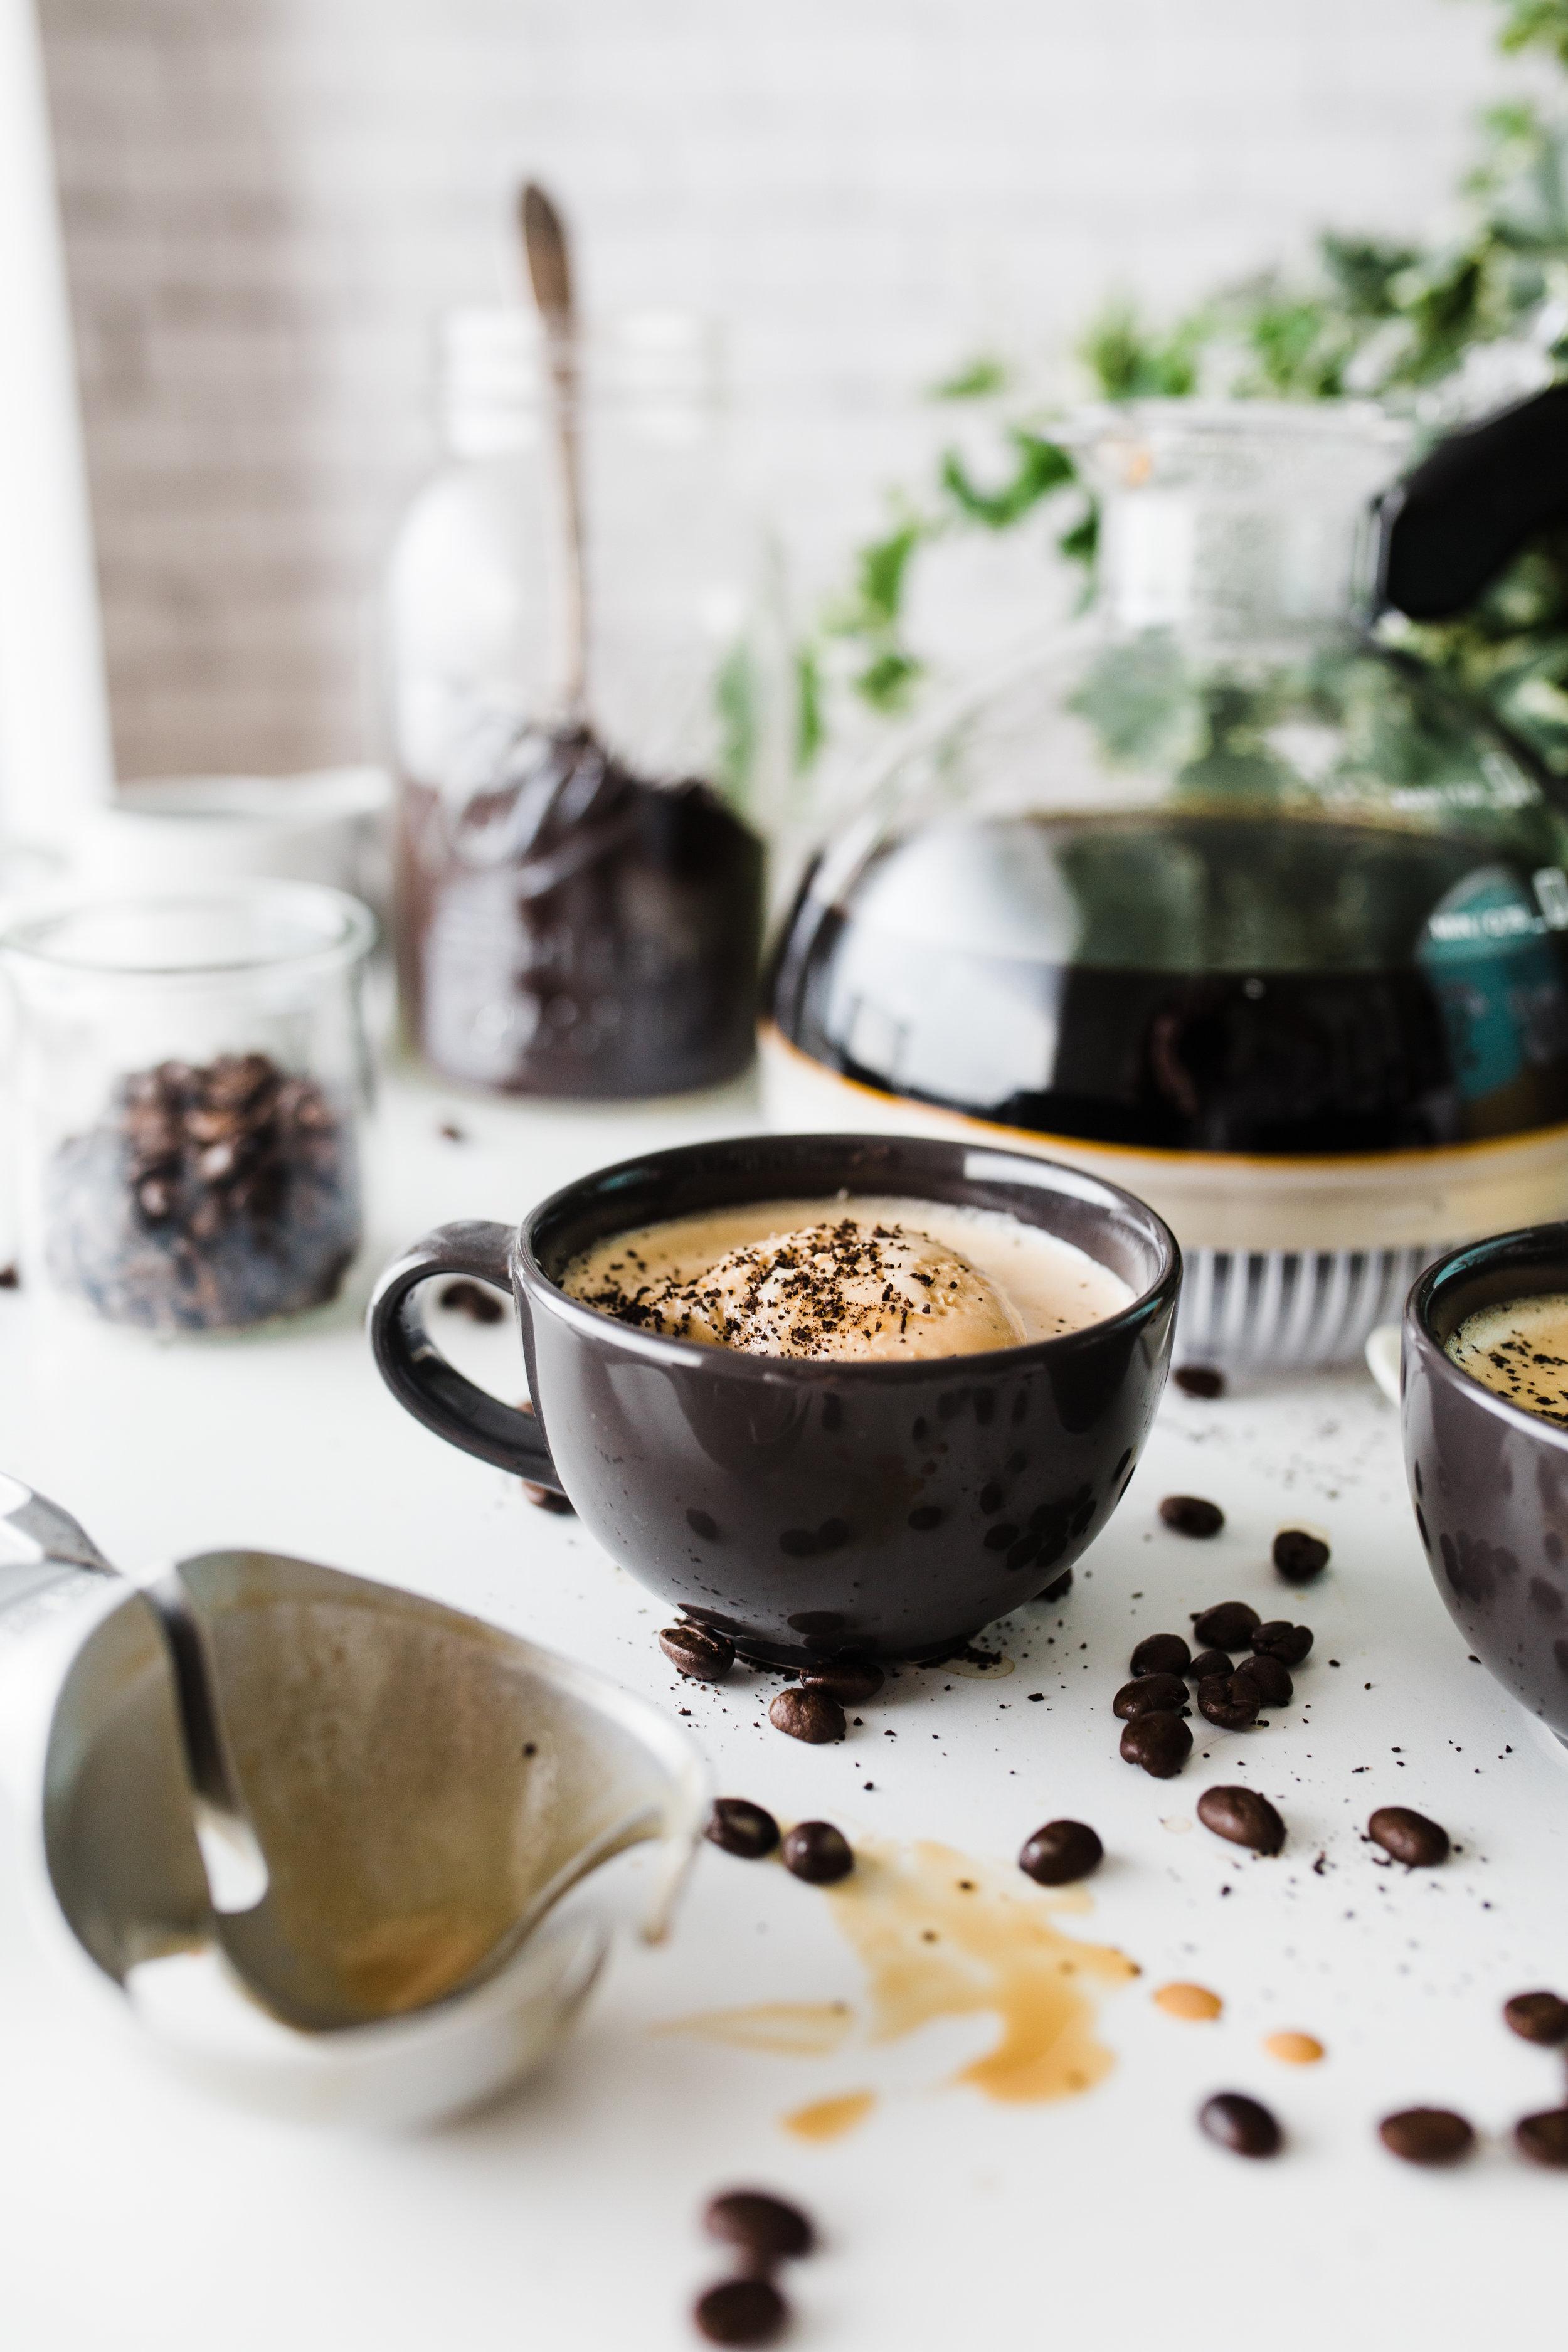 2018-02 IHA COFFEE - Vaccum - Salted Caramel Affogato 10.jpg